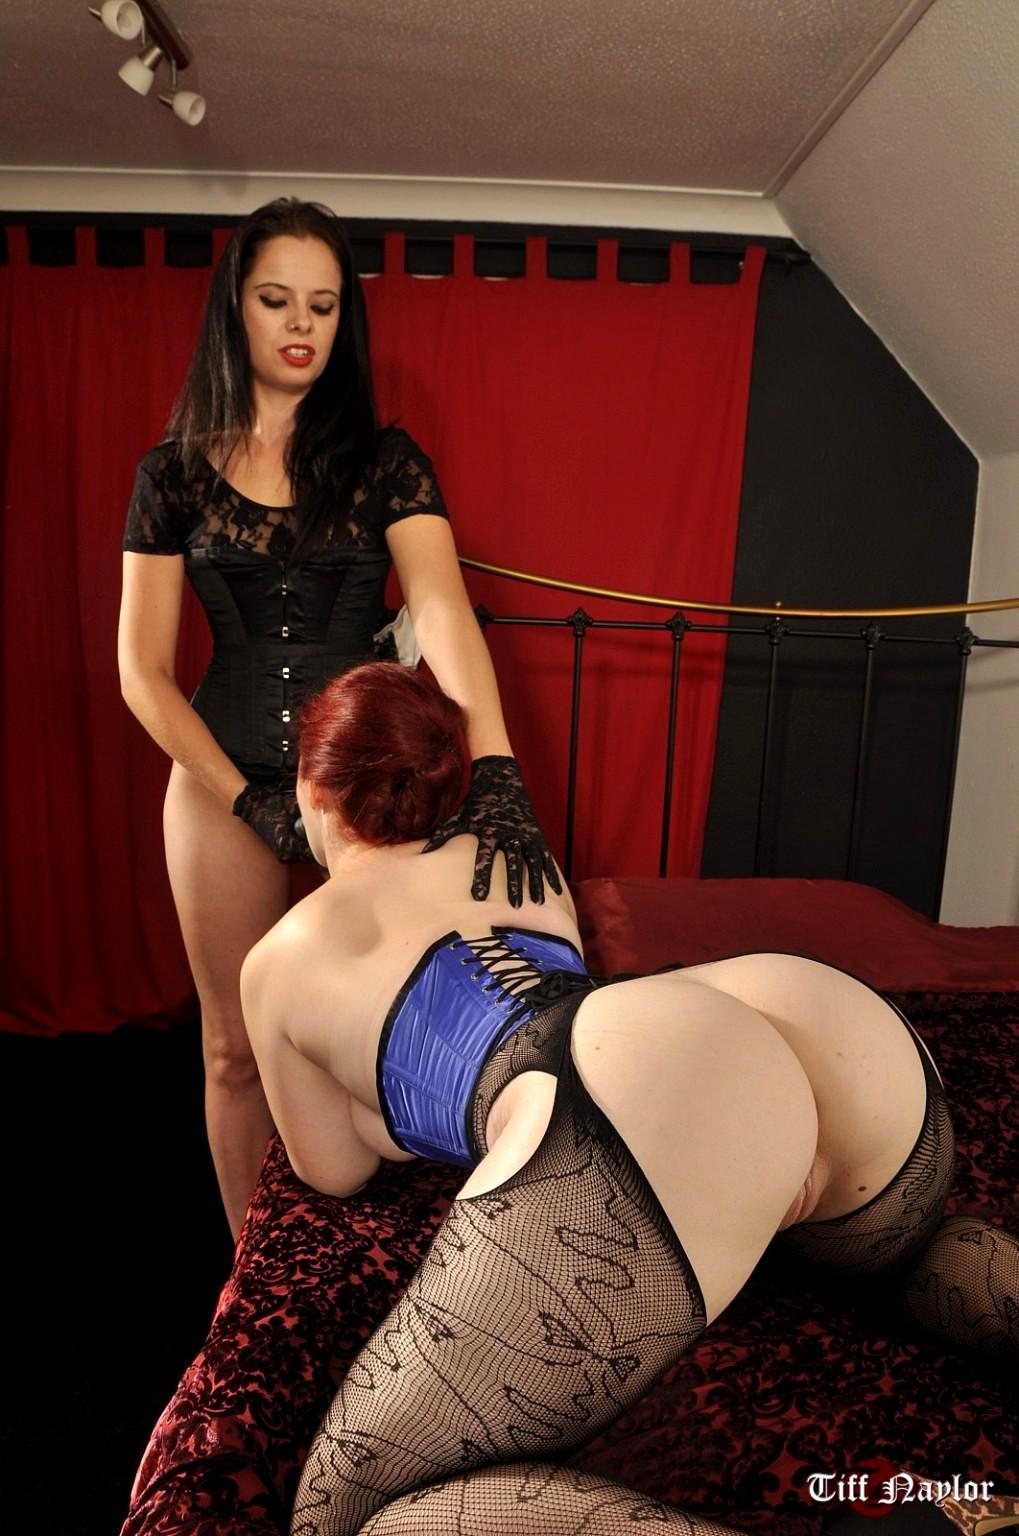 Tiffnaylor Tiffany Naylor Foxies Strapon Kittycream Free Pornpics Sexphotos Xxximages Hd Gallery